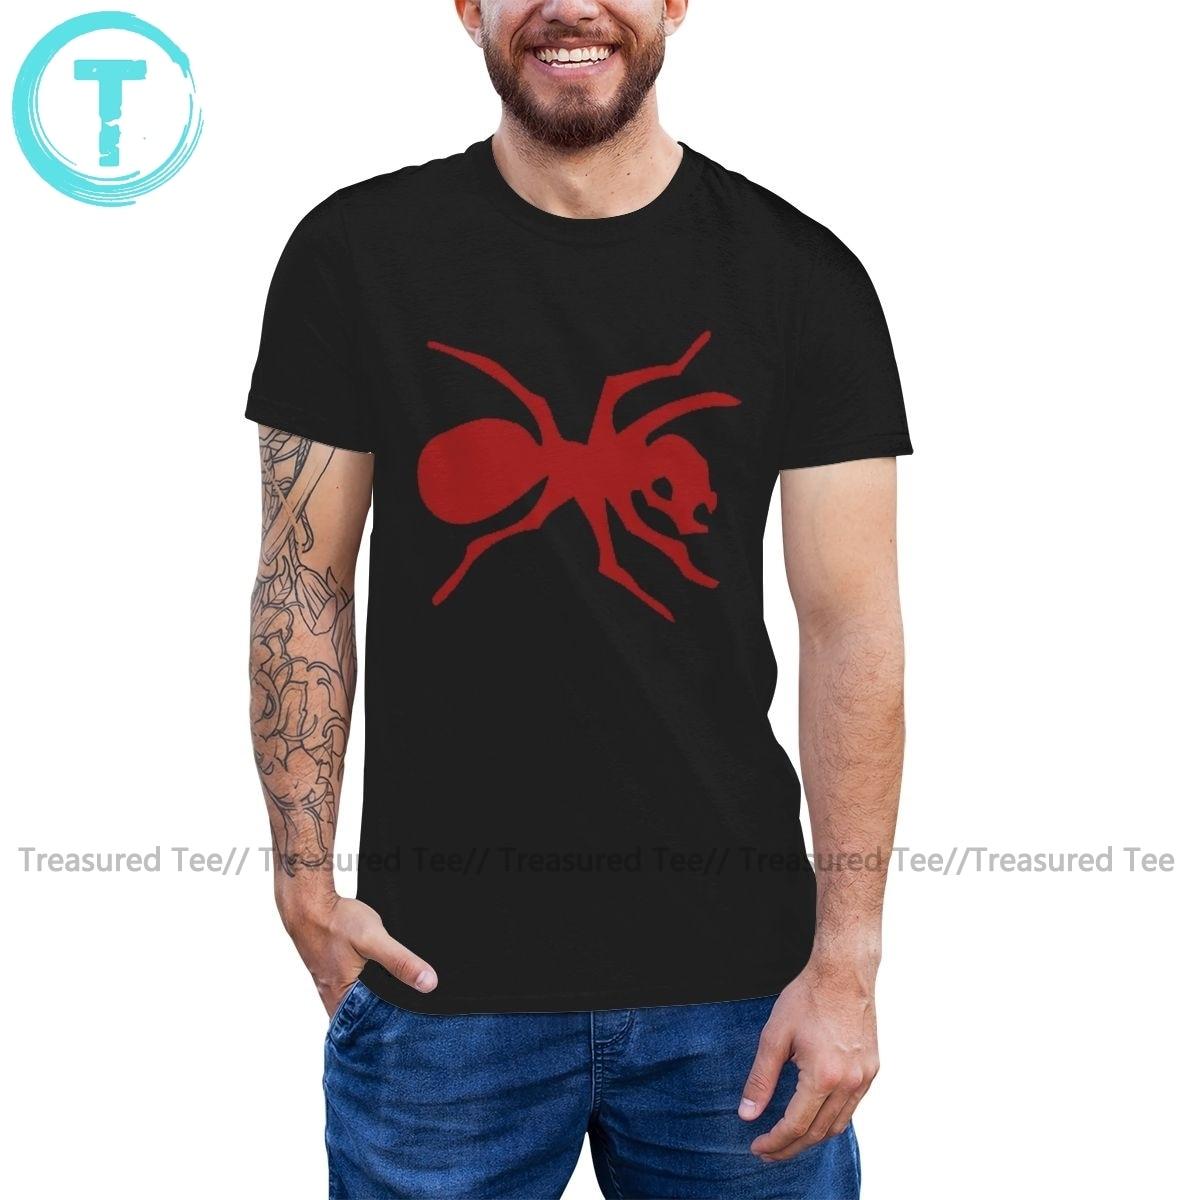 El prodigio camiseta la camiseta de Prodigy Oversize 100 por ciento algodón camiseta hombres Streetwear divertida camiseta